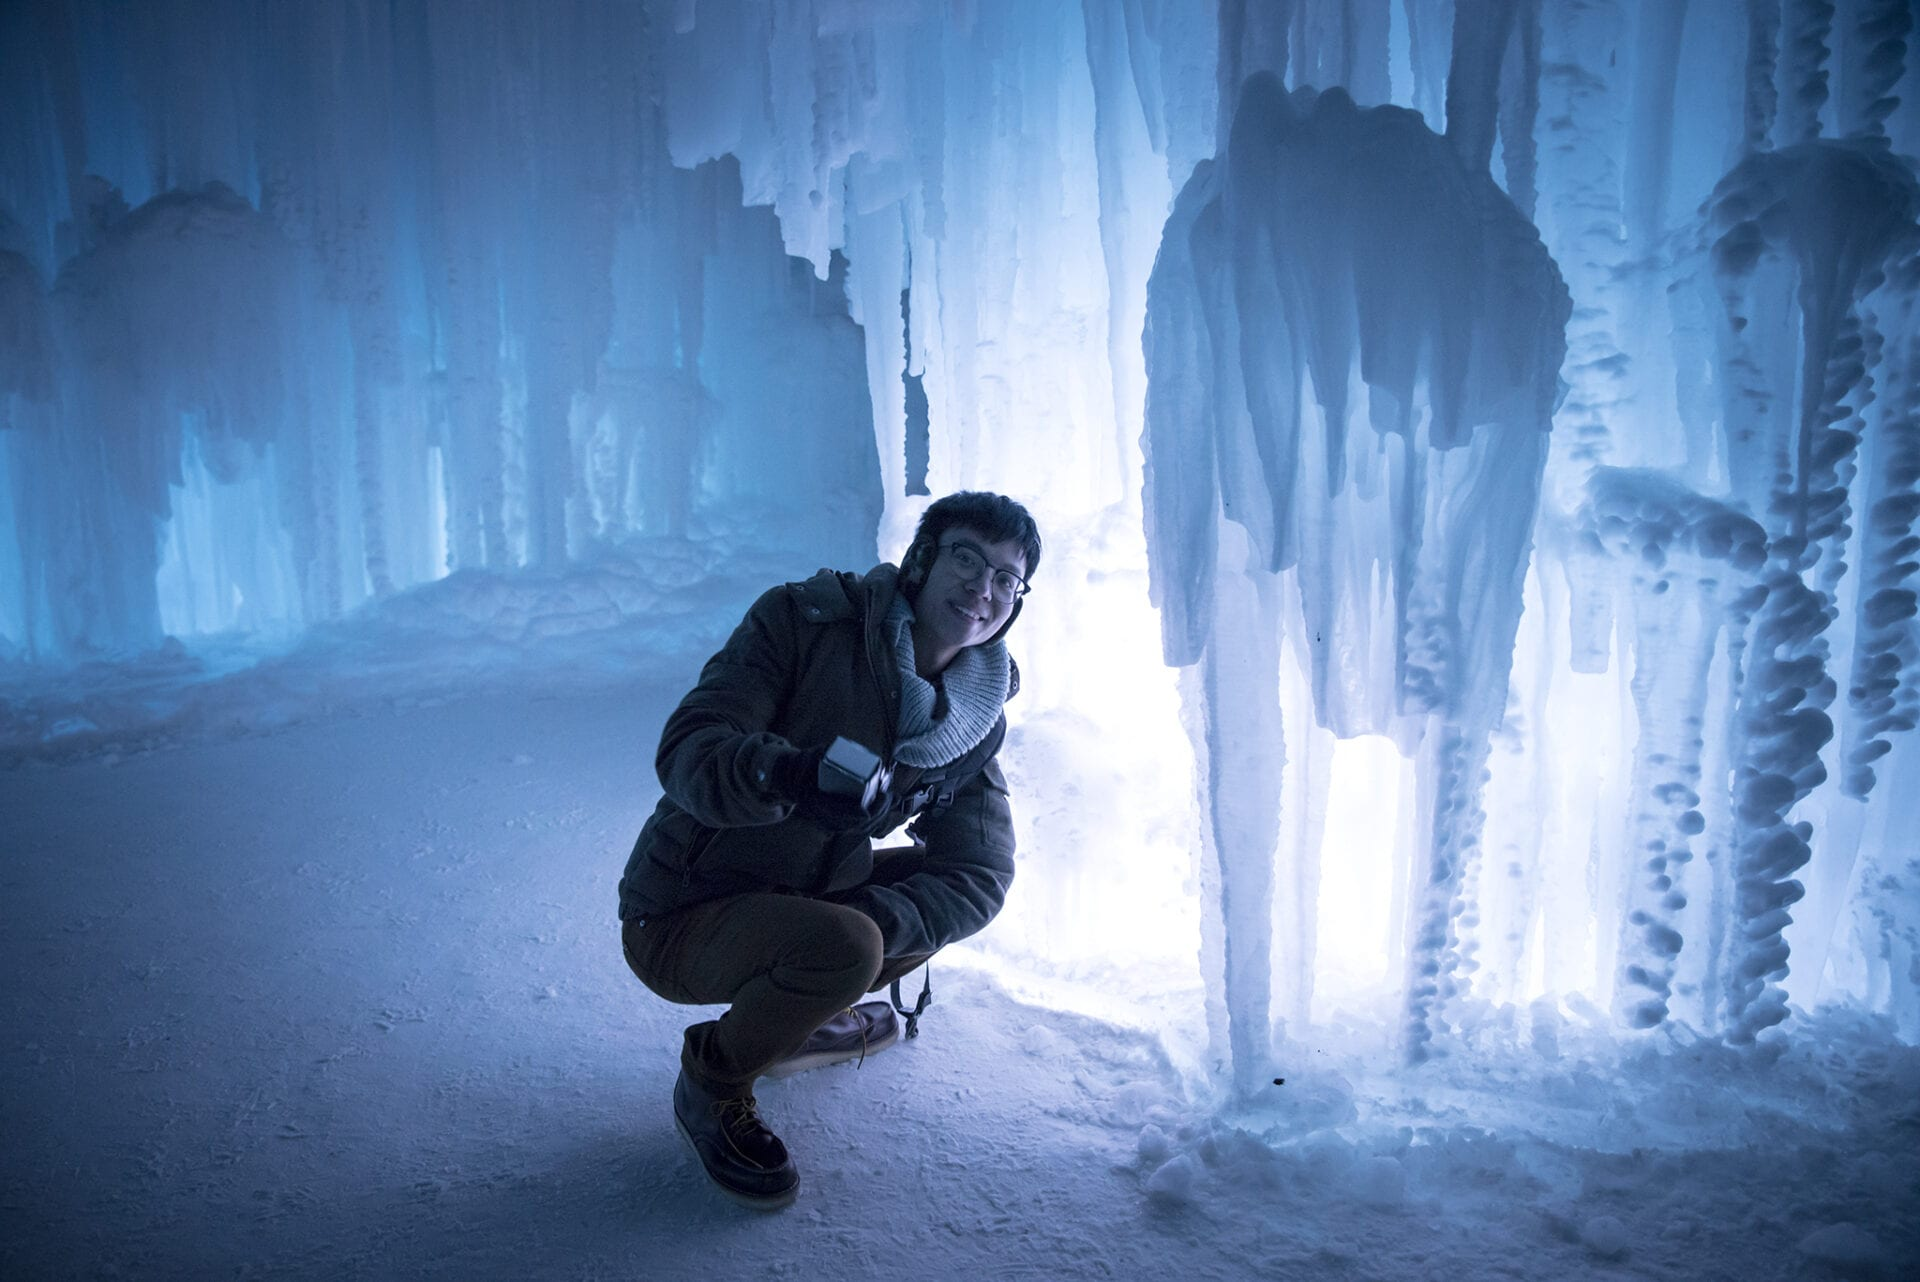 Ice Castles Edmonton Alberta Winter Visit Hawrelak Park-005